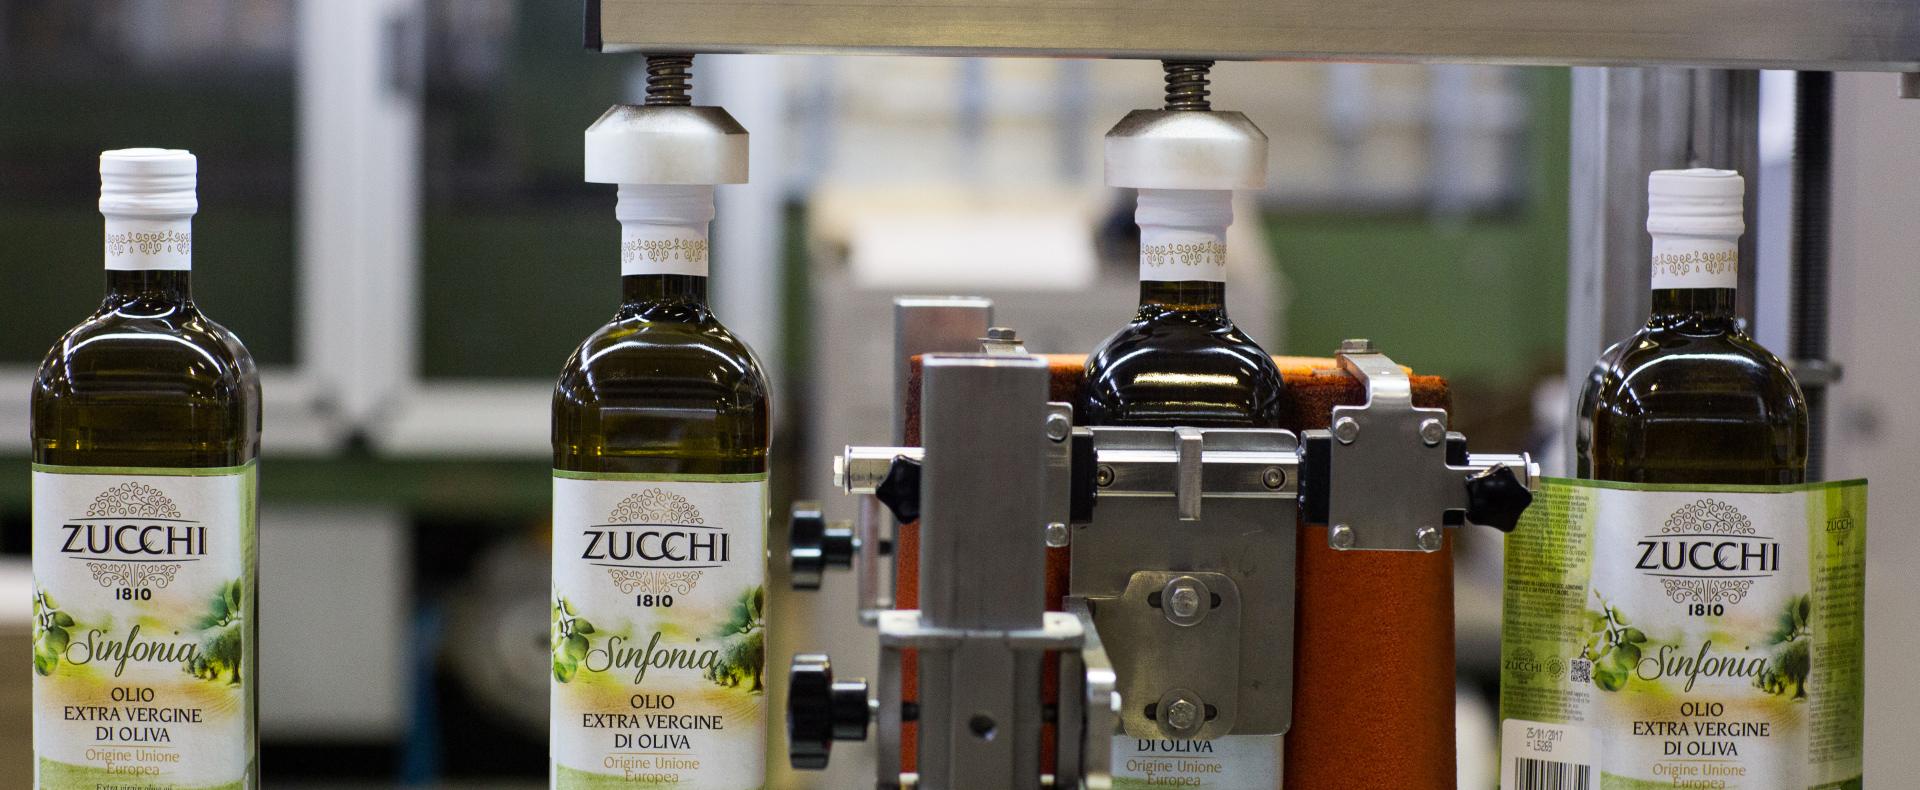 Oleificio Zucchi